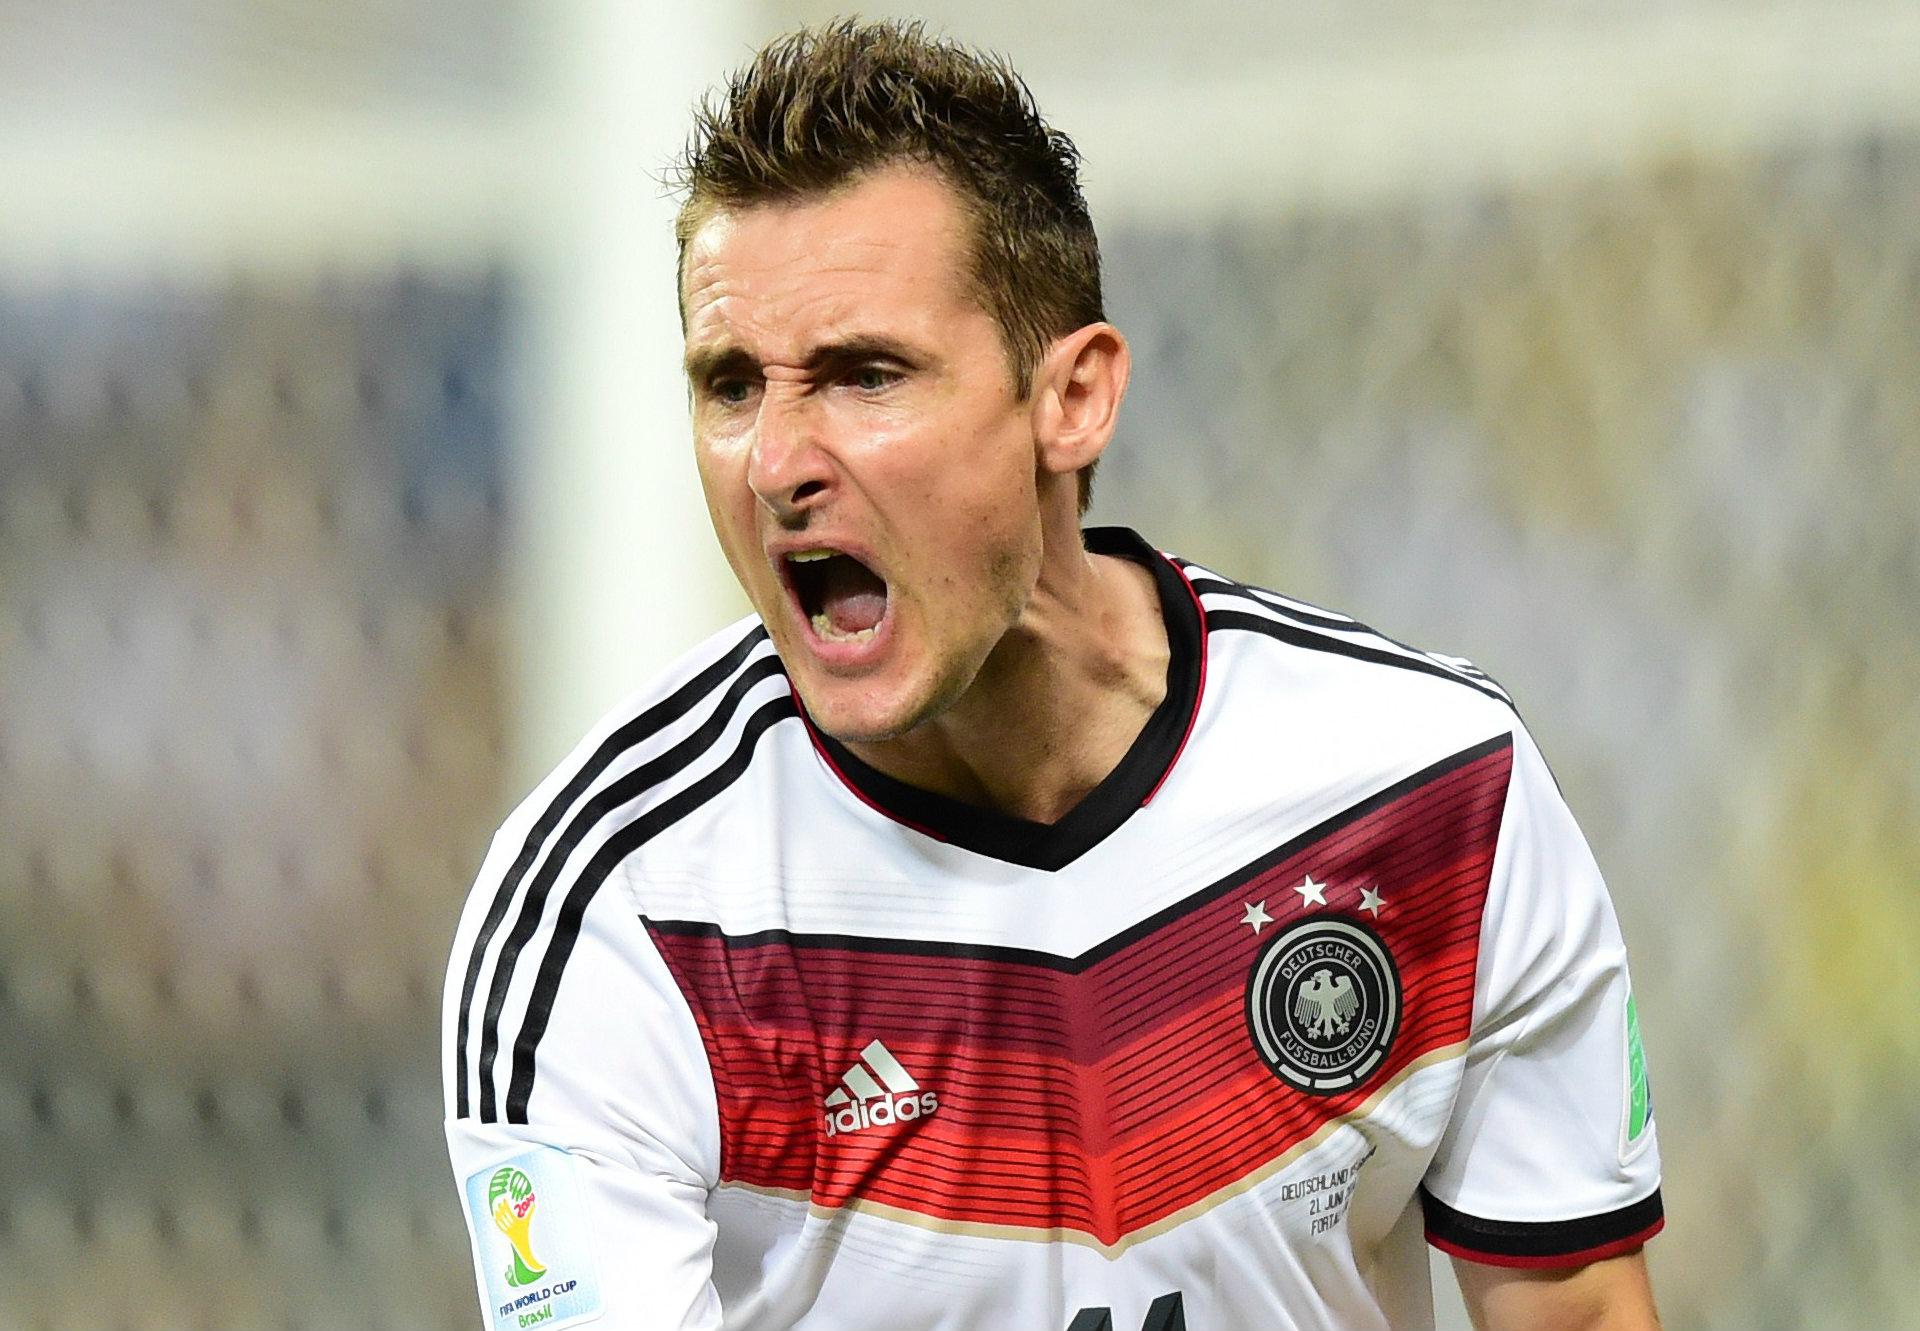 Miroslav-klose-germany-ghana-world-cup-2014-group-g-06212014_47vvslqhevxi1jl2fmw3wjce6